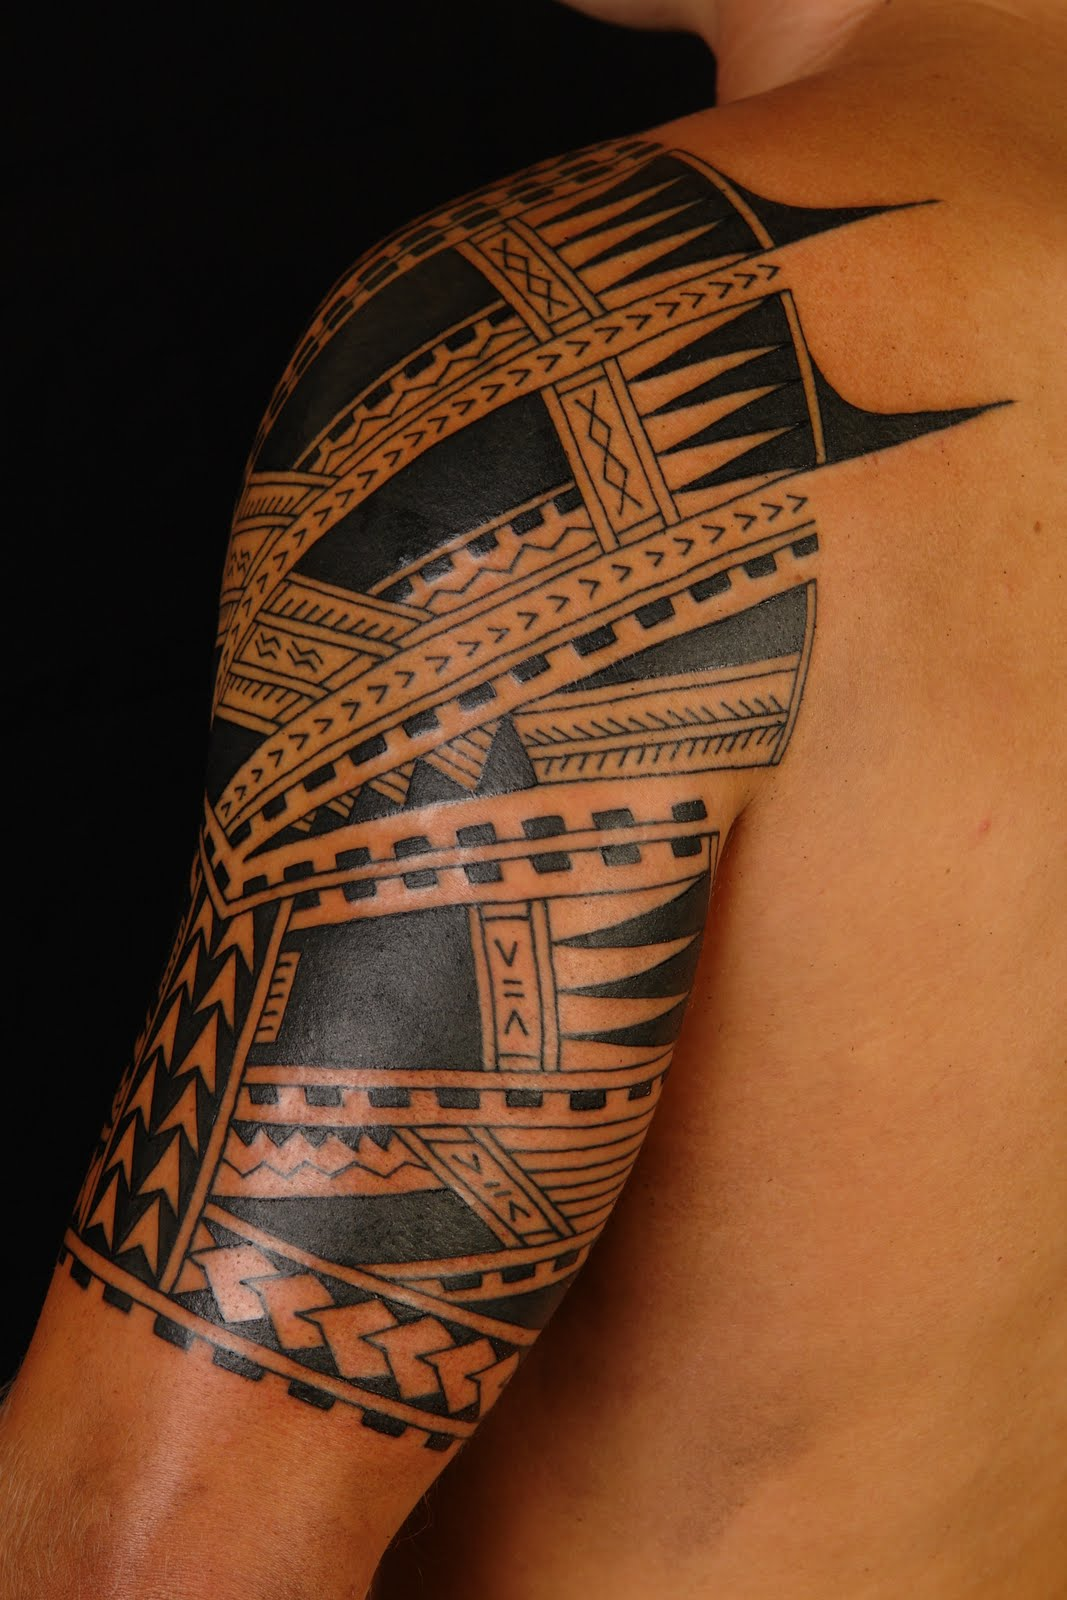 tribal tattoos designs samoan tattoos designs. Black Bedroom Furniture Sets. Home Design Ideas